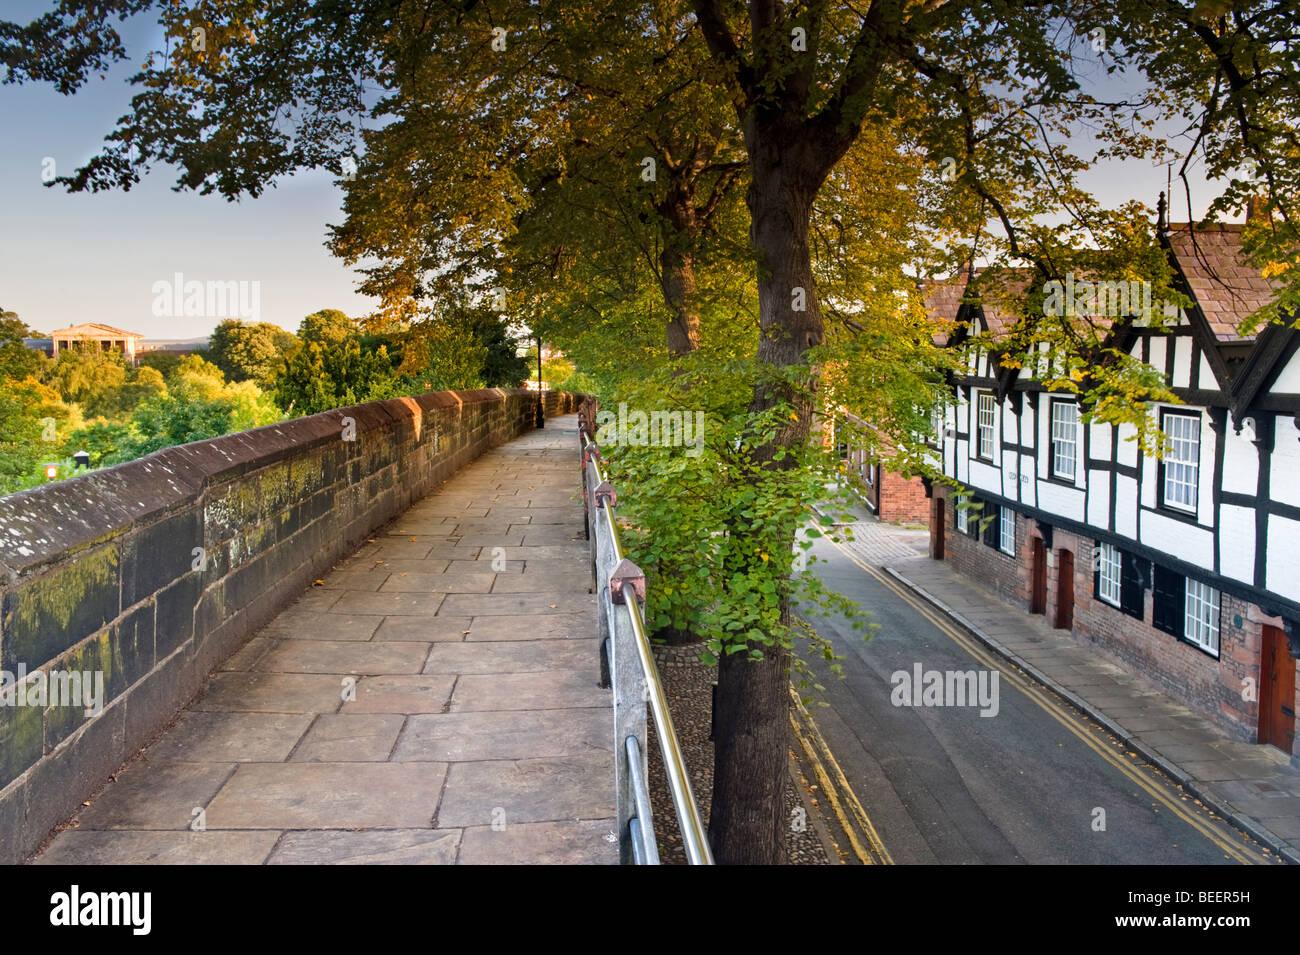 Les neuf maisons et remparts romains, Chester, Cheshire, Angleterre, Royaume-Uni Photo Stock